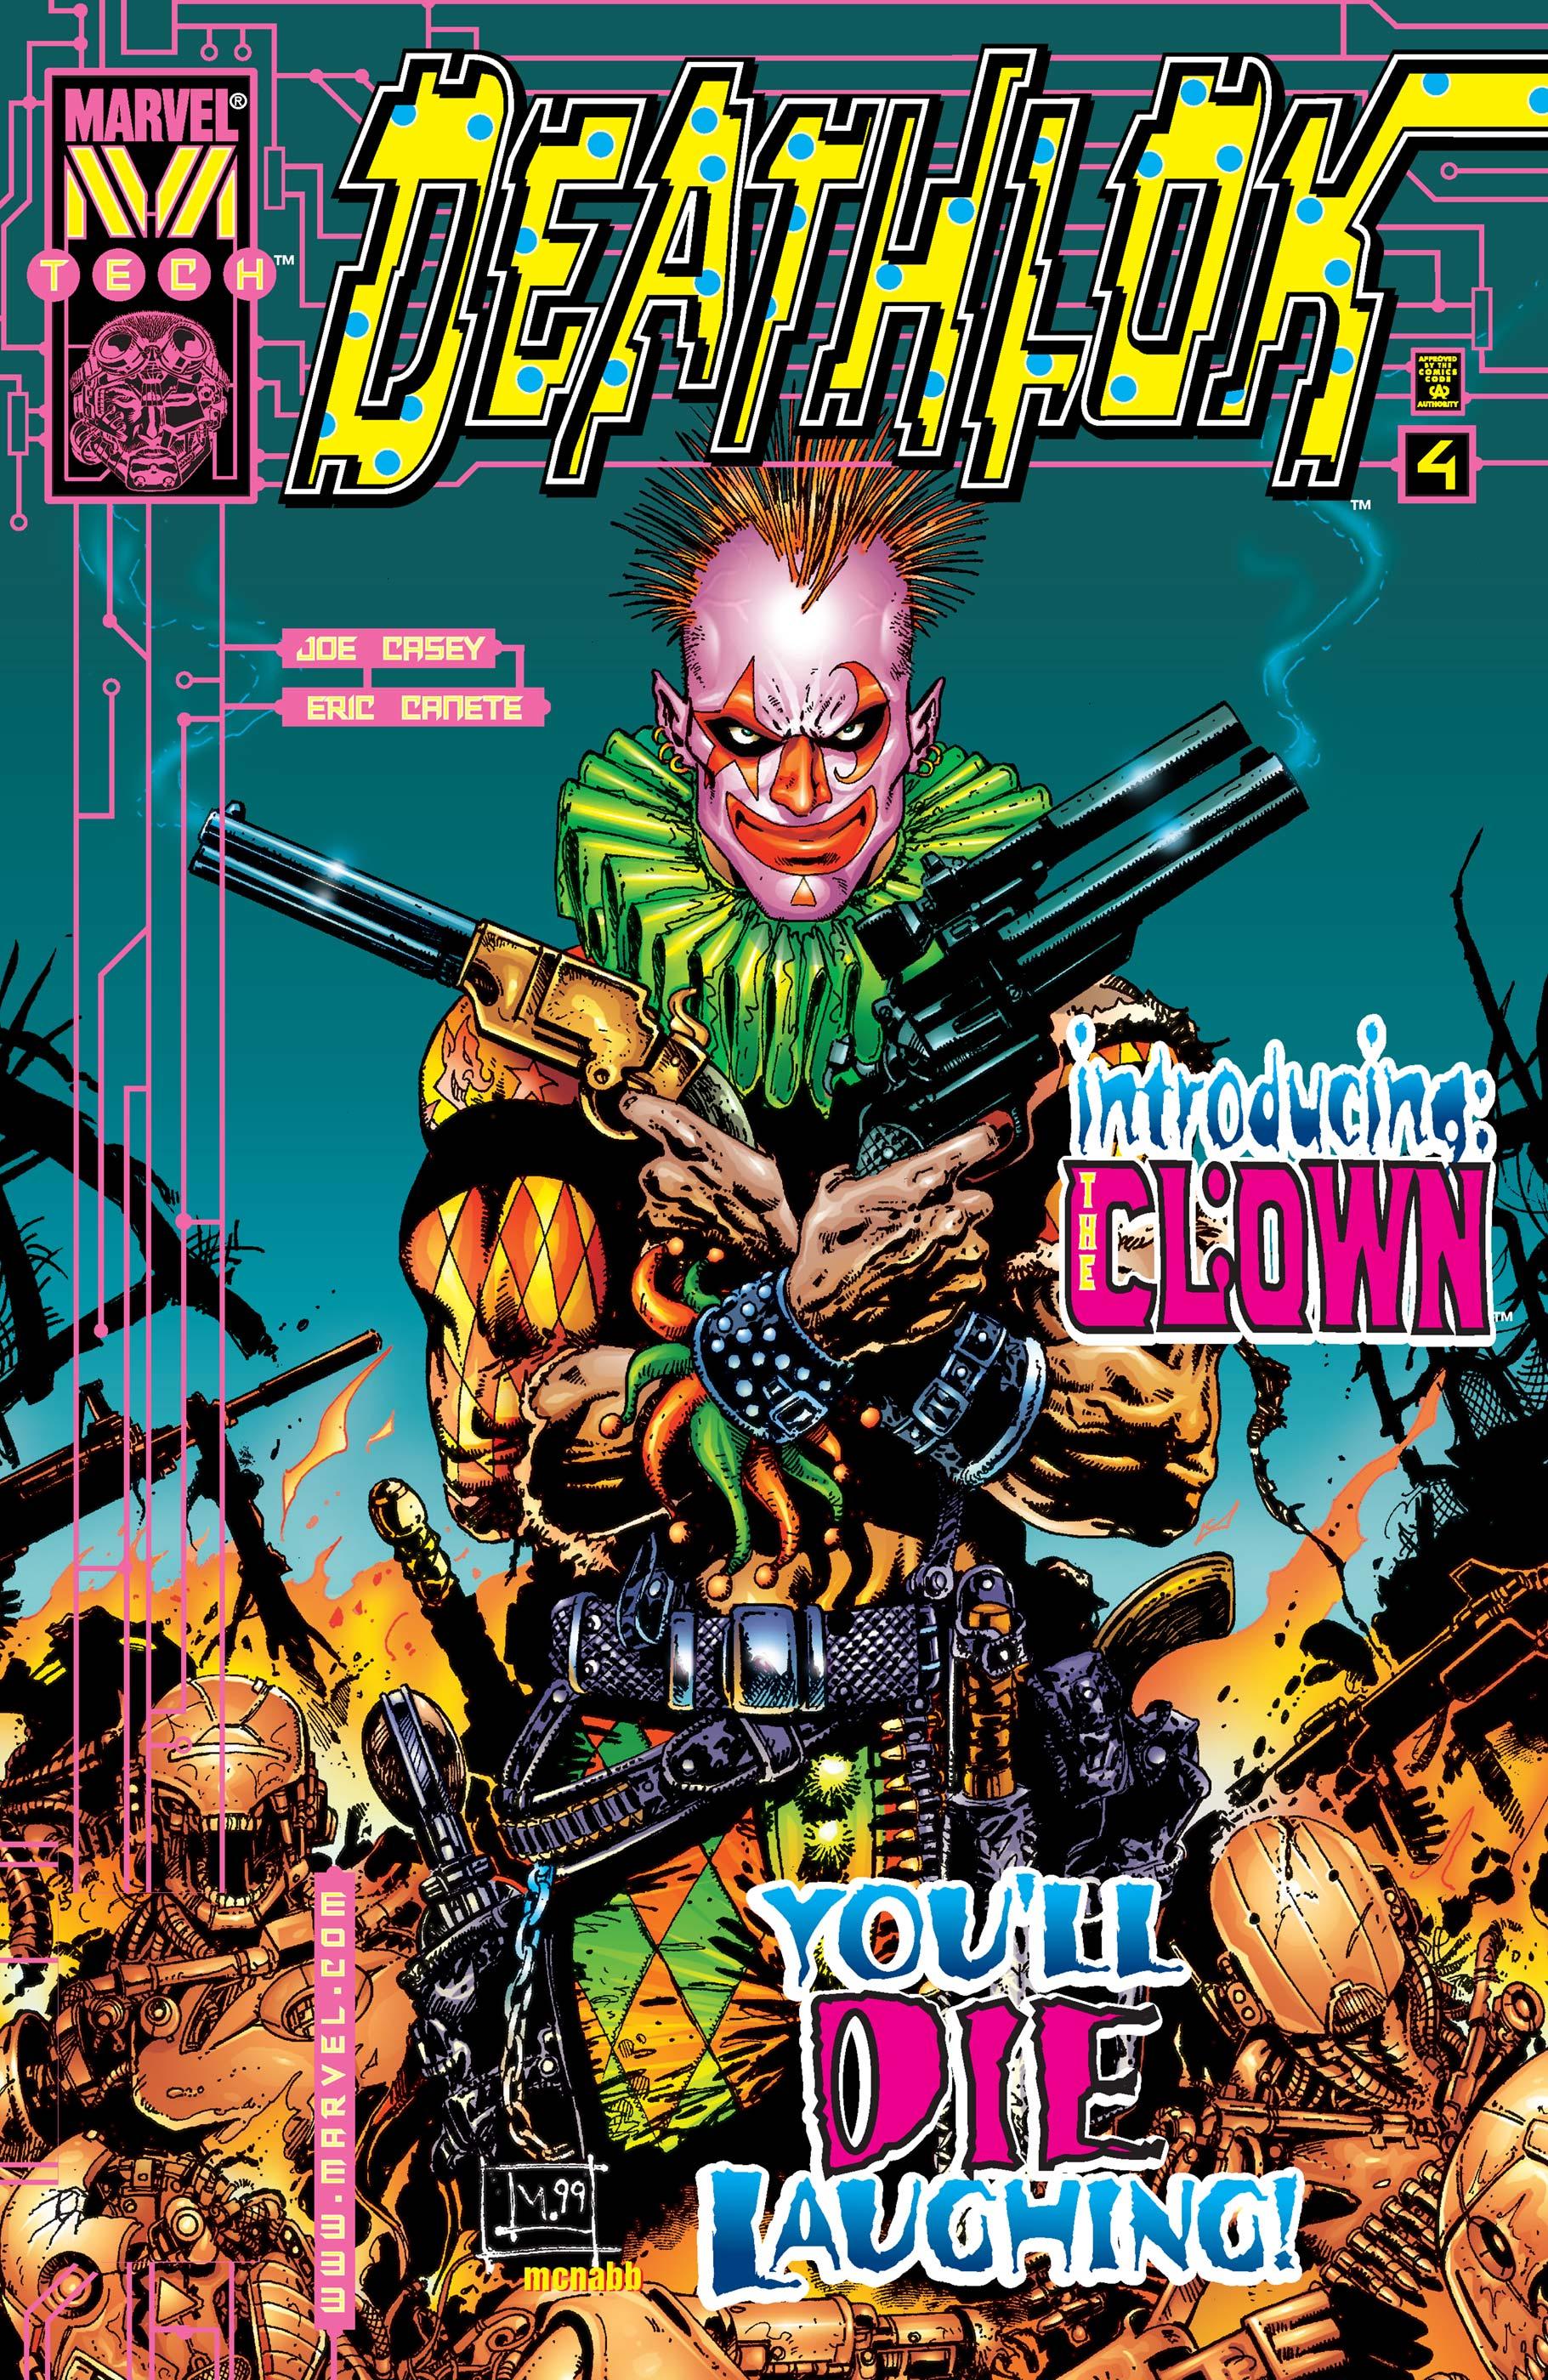 Deathlok (1999) #4